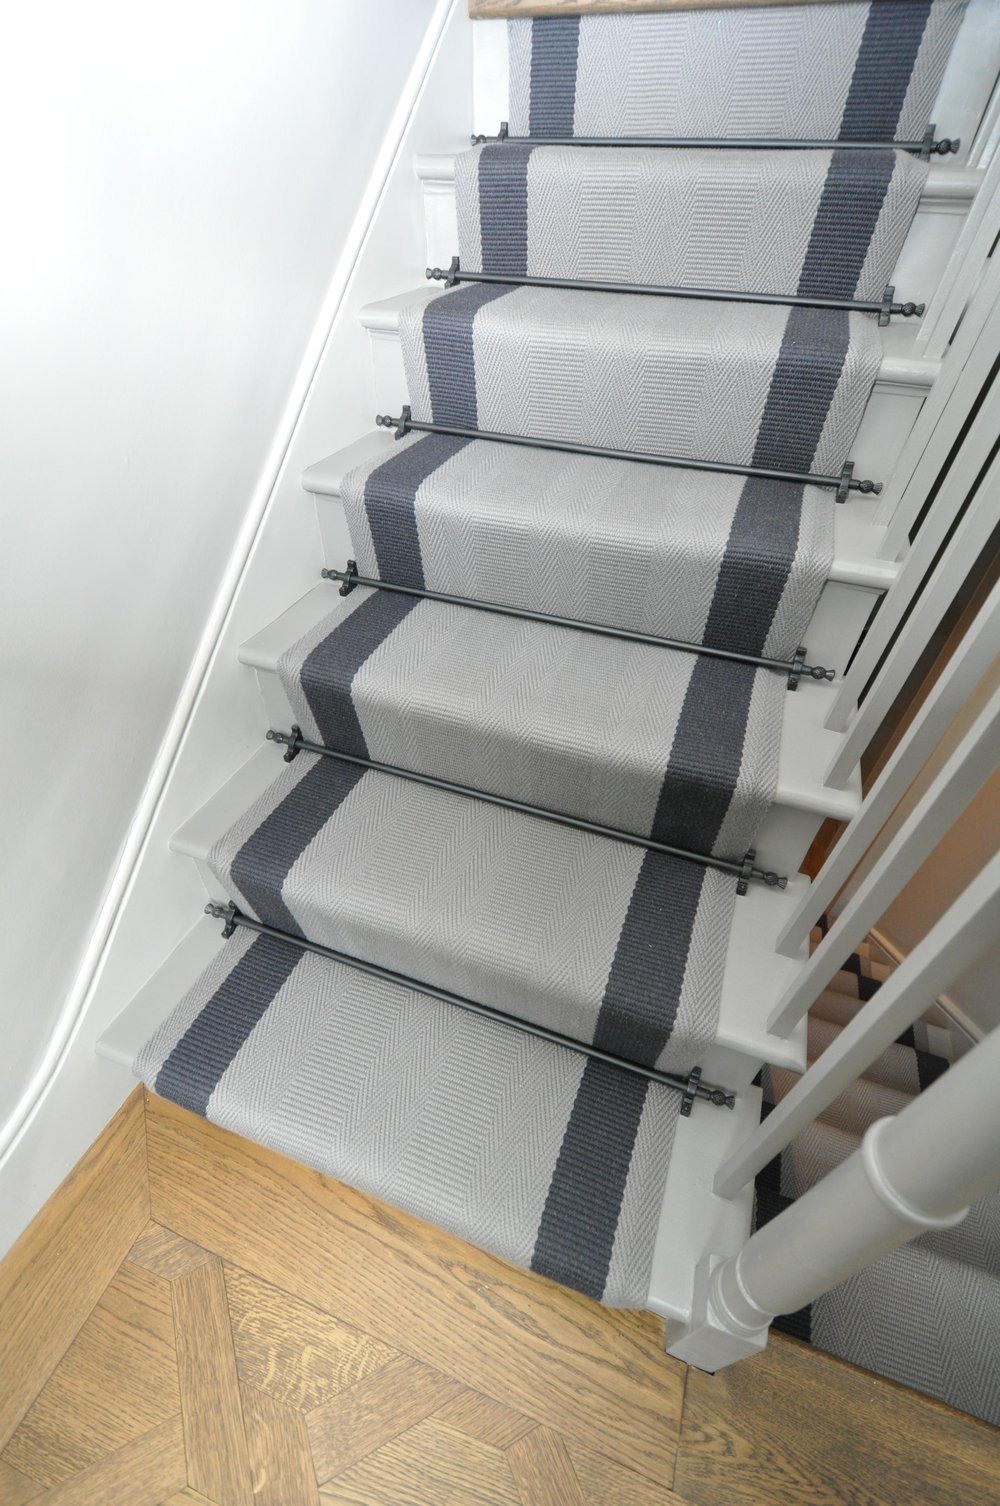 flatweave-stair-runner-london-bowloom-off-the-loom-geometric-carpet-DSC_1129.jpg